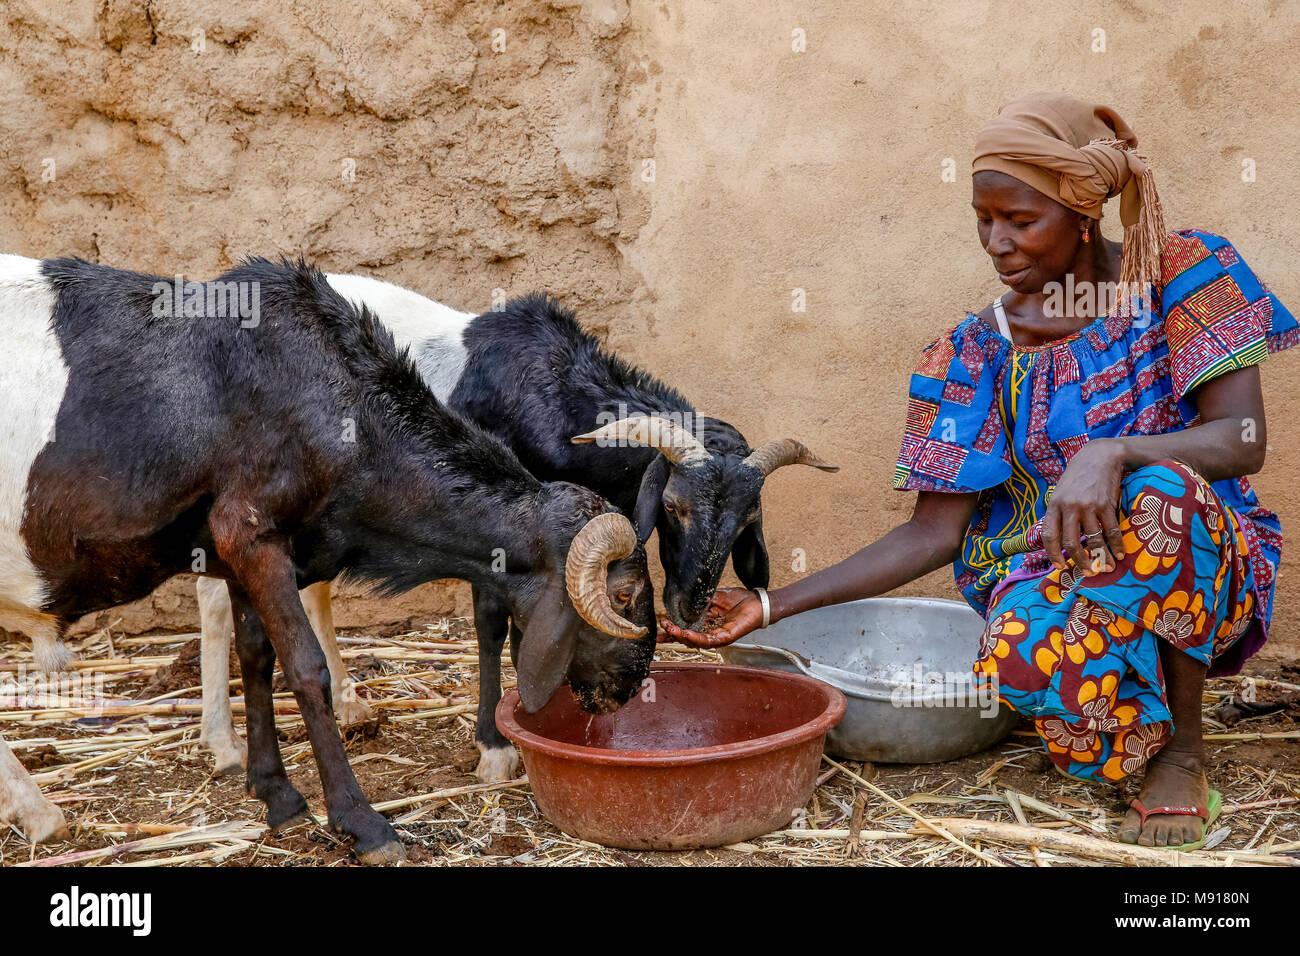 UBTEC NGO in a village near Ouahigouya, Burkina Faso. Cattle breeder Animata Guiro. - Stock Image